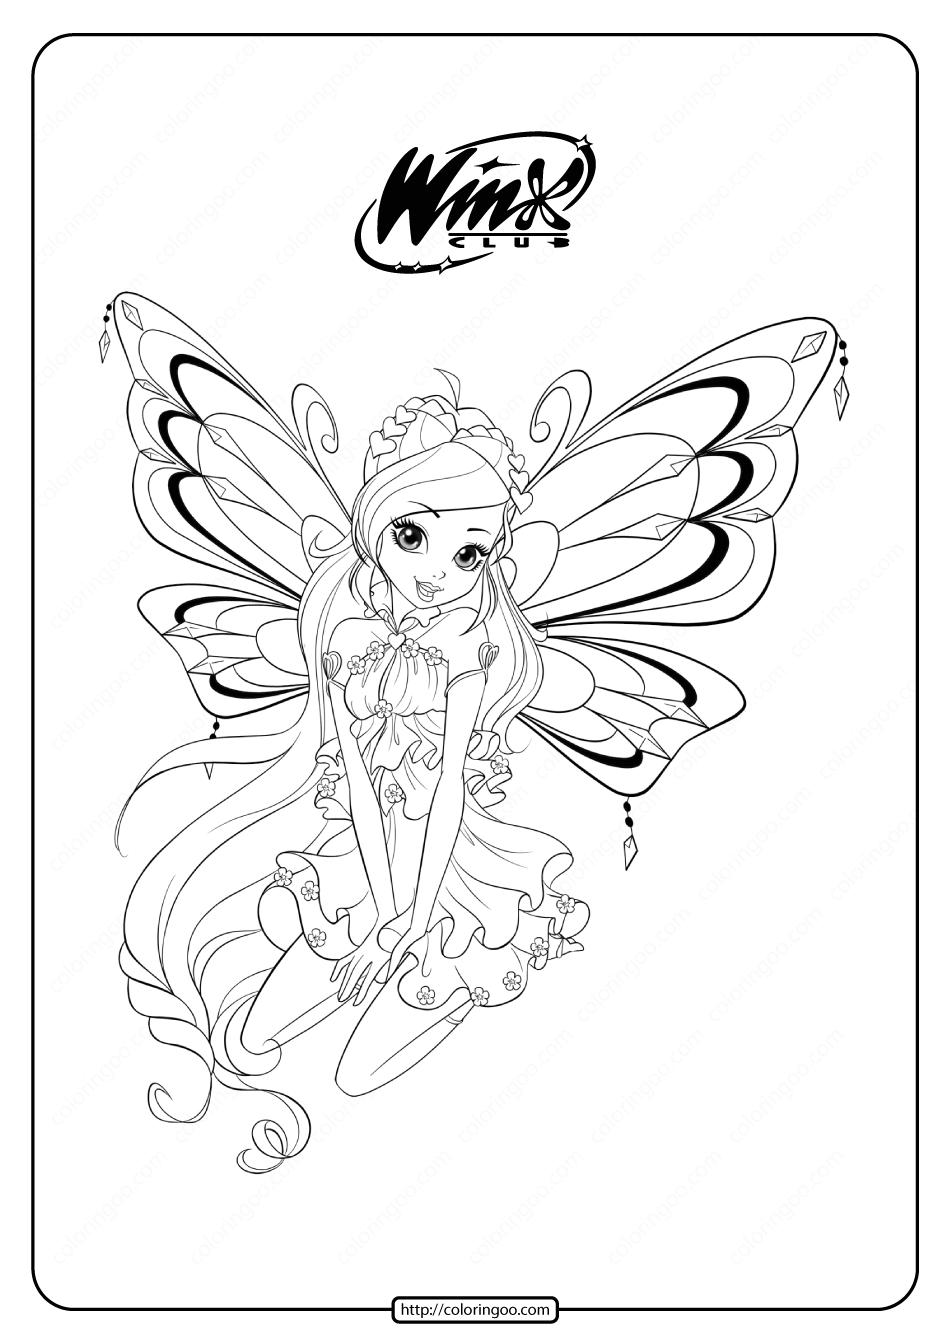 Printable Winx Cbub Enchantix Bloom Coloring Pages